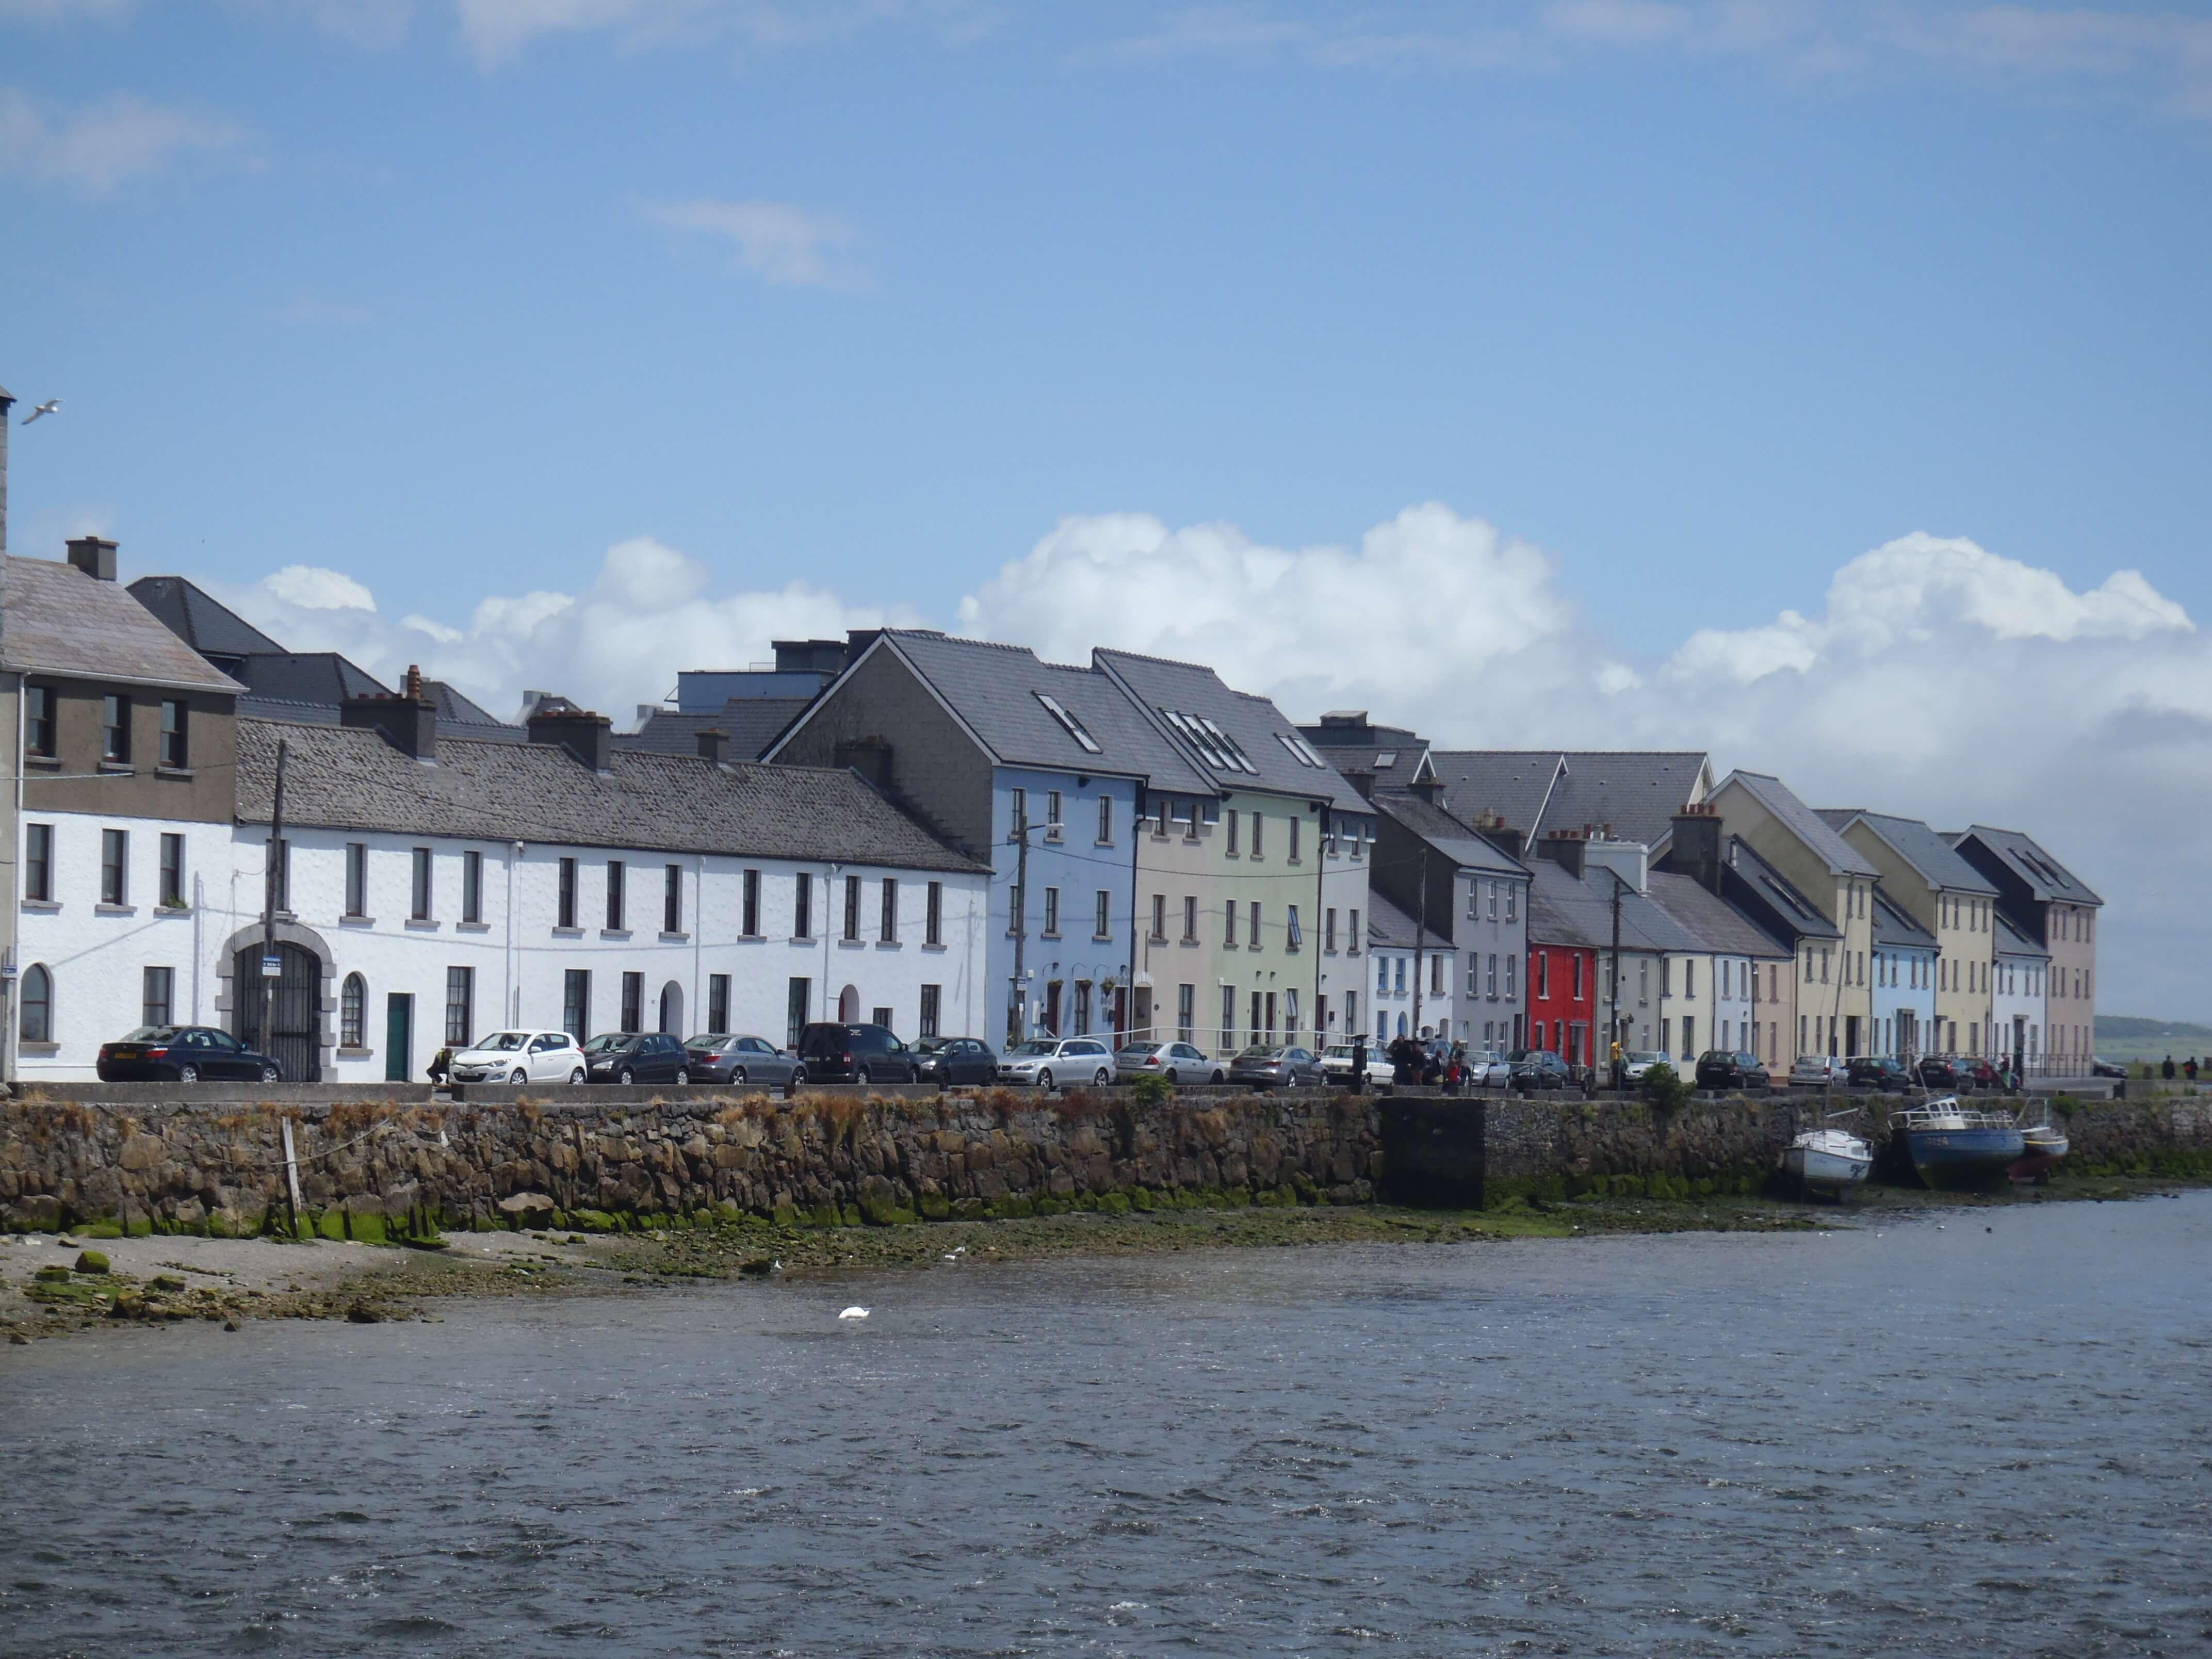 http://www.blog-trotteurs.com/wp-content/uploads/2013/06/Galway_houses.jpg